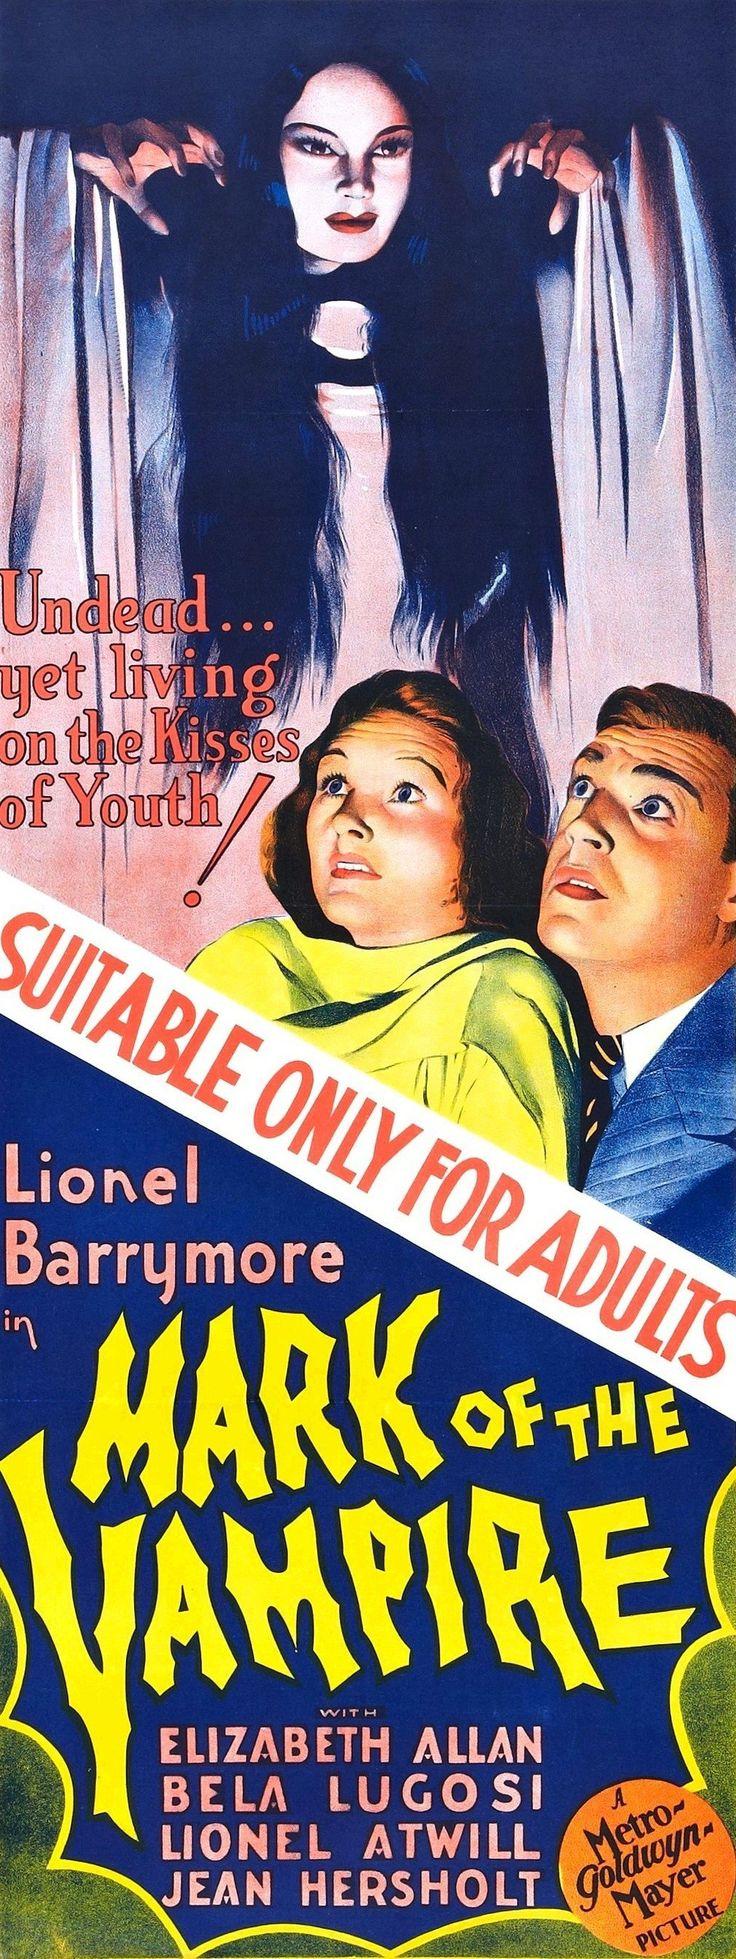 """MARK OF THE VAMPIRE"".  (1934)"